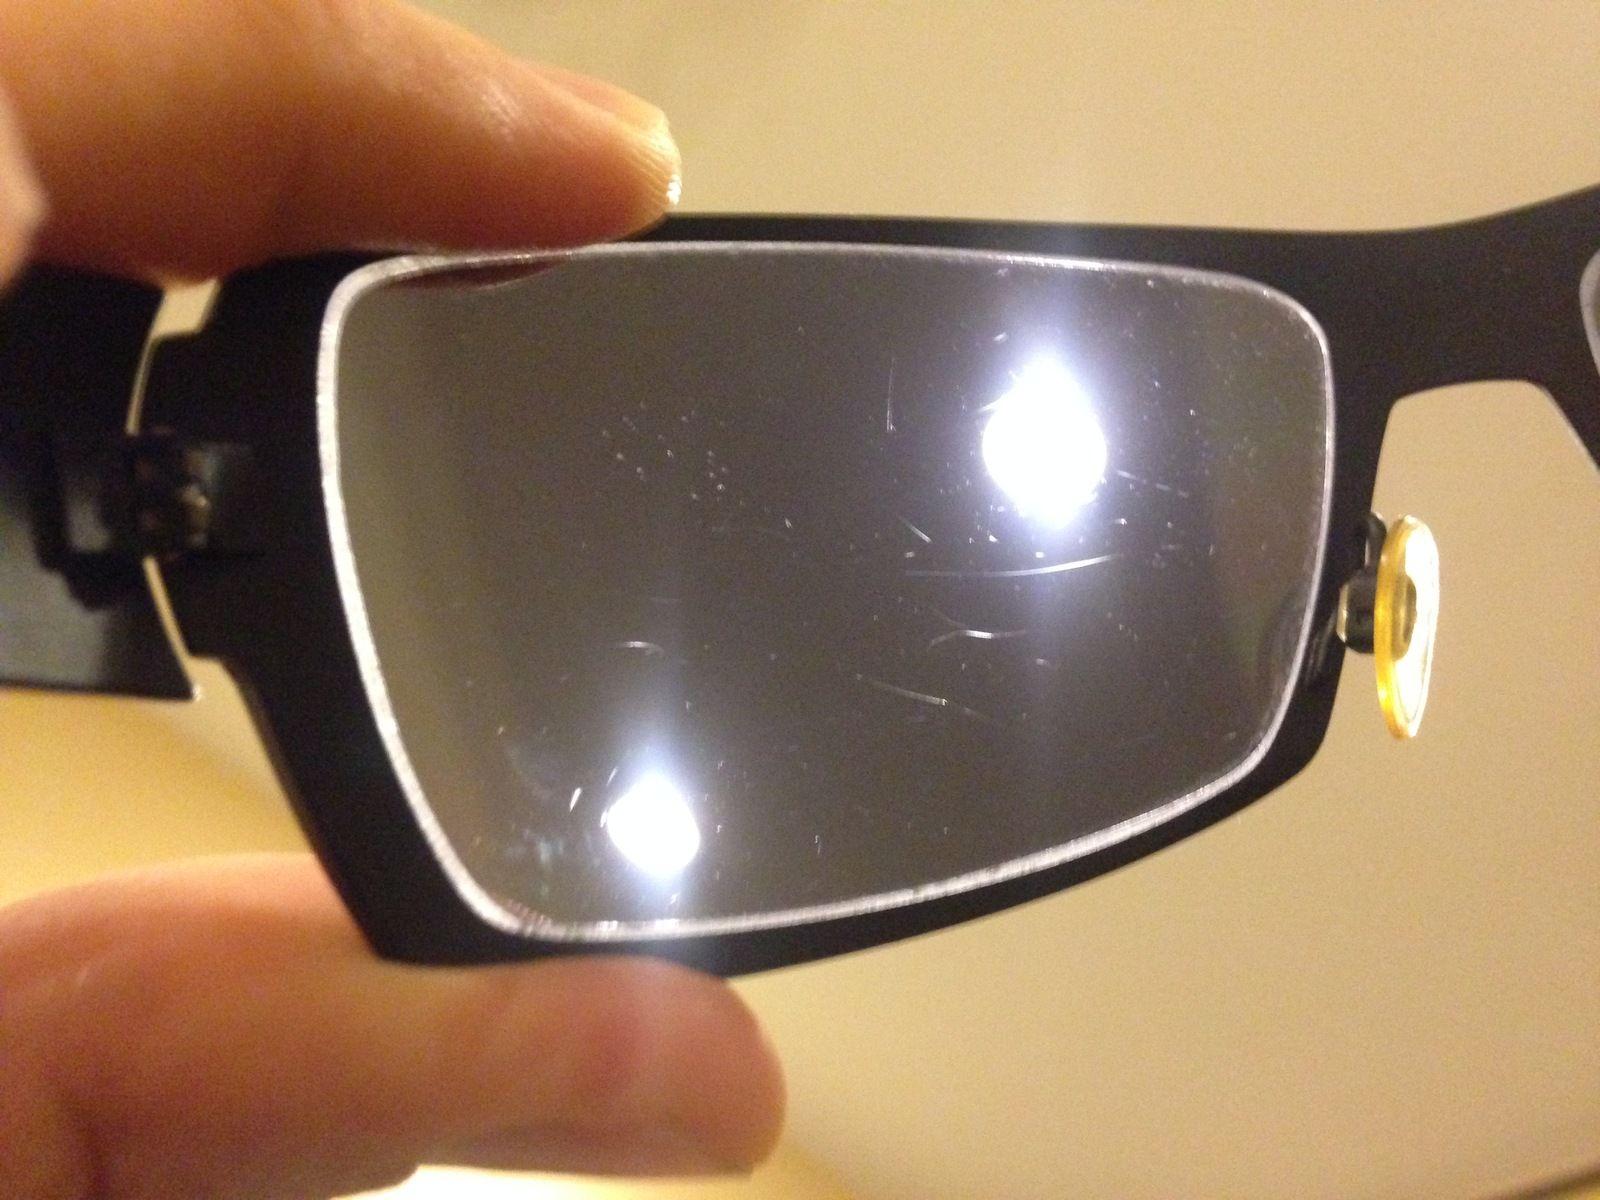 Spike Matte Black (Asian fit) - price drop - 8SrAKd0.jpg